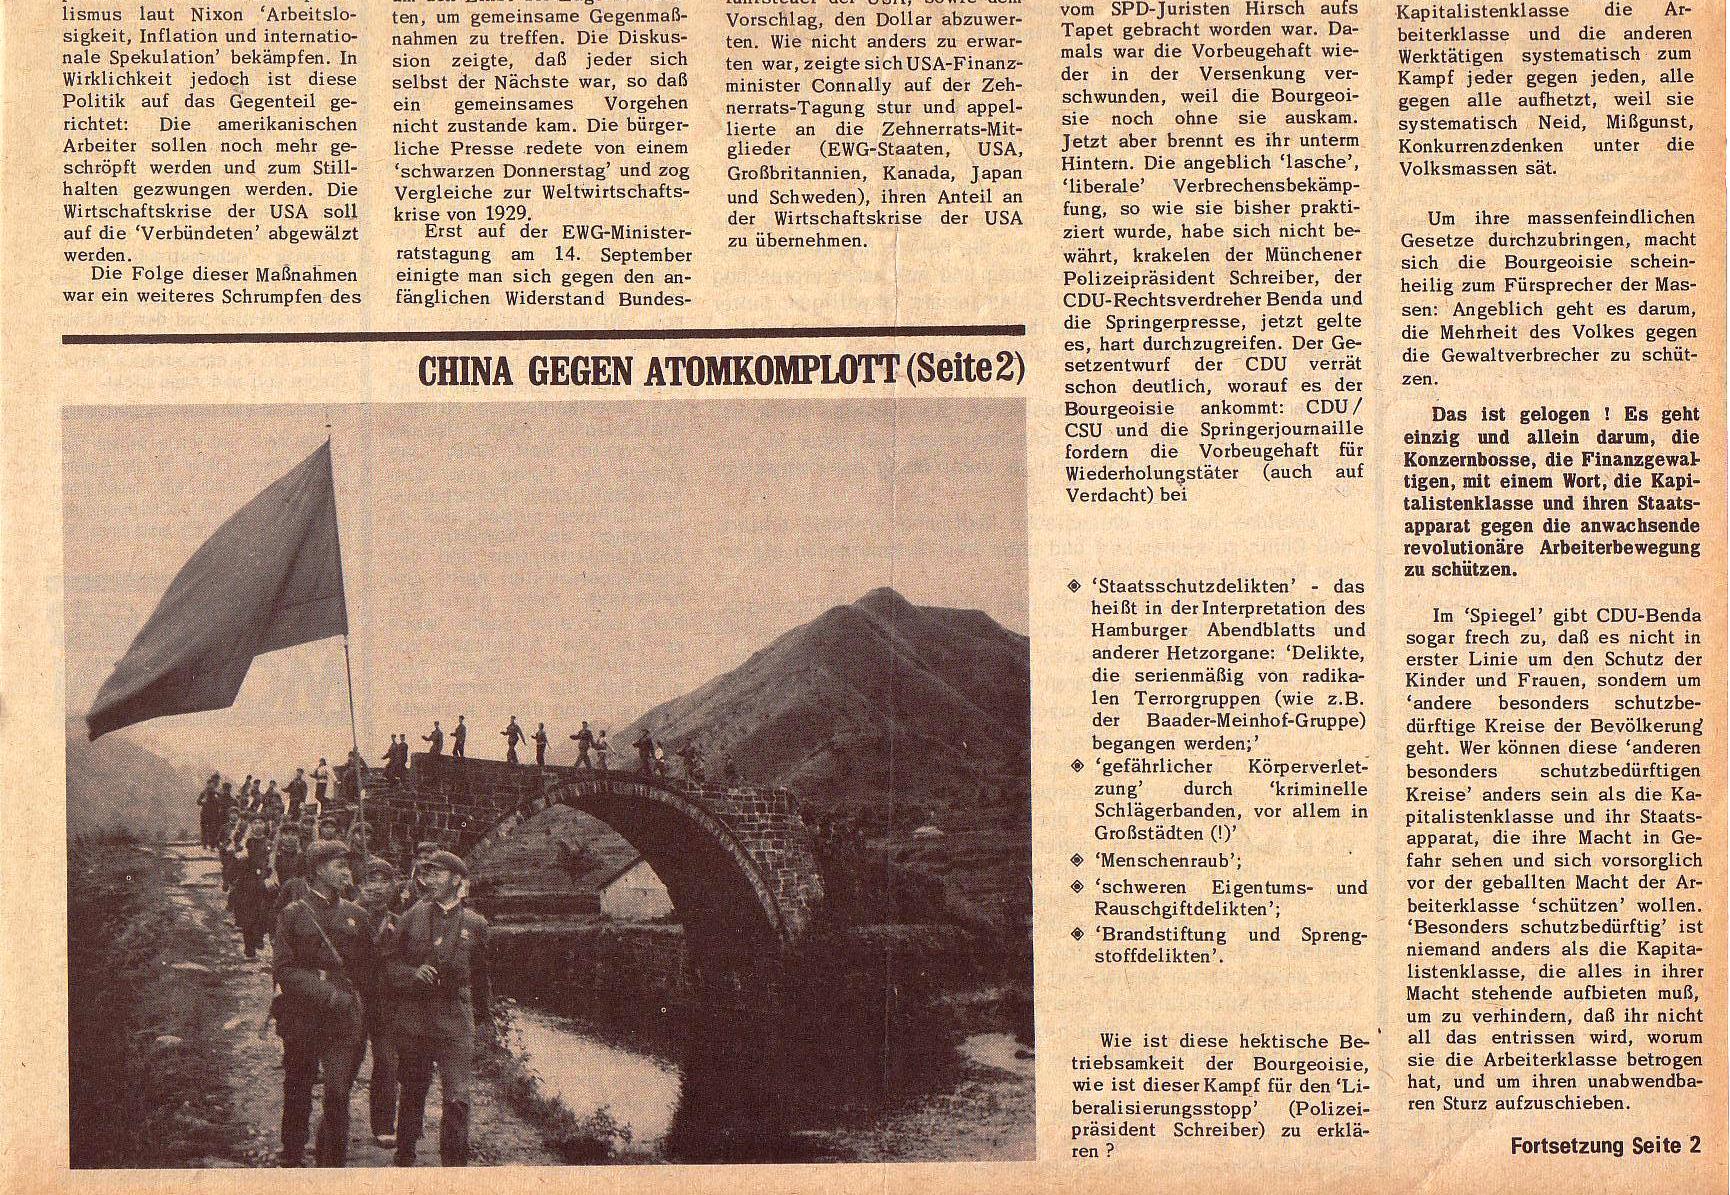 Roter Morgen, 5. Jg., 27. September 1971, Nr. 10, Seite 1b